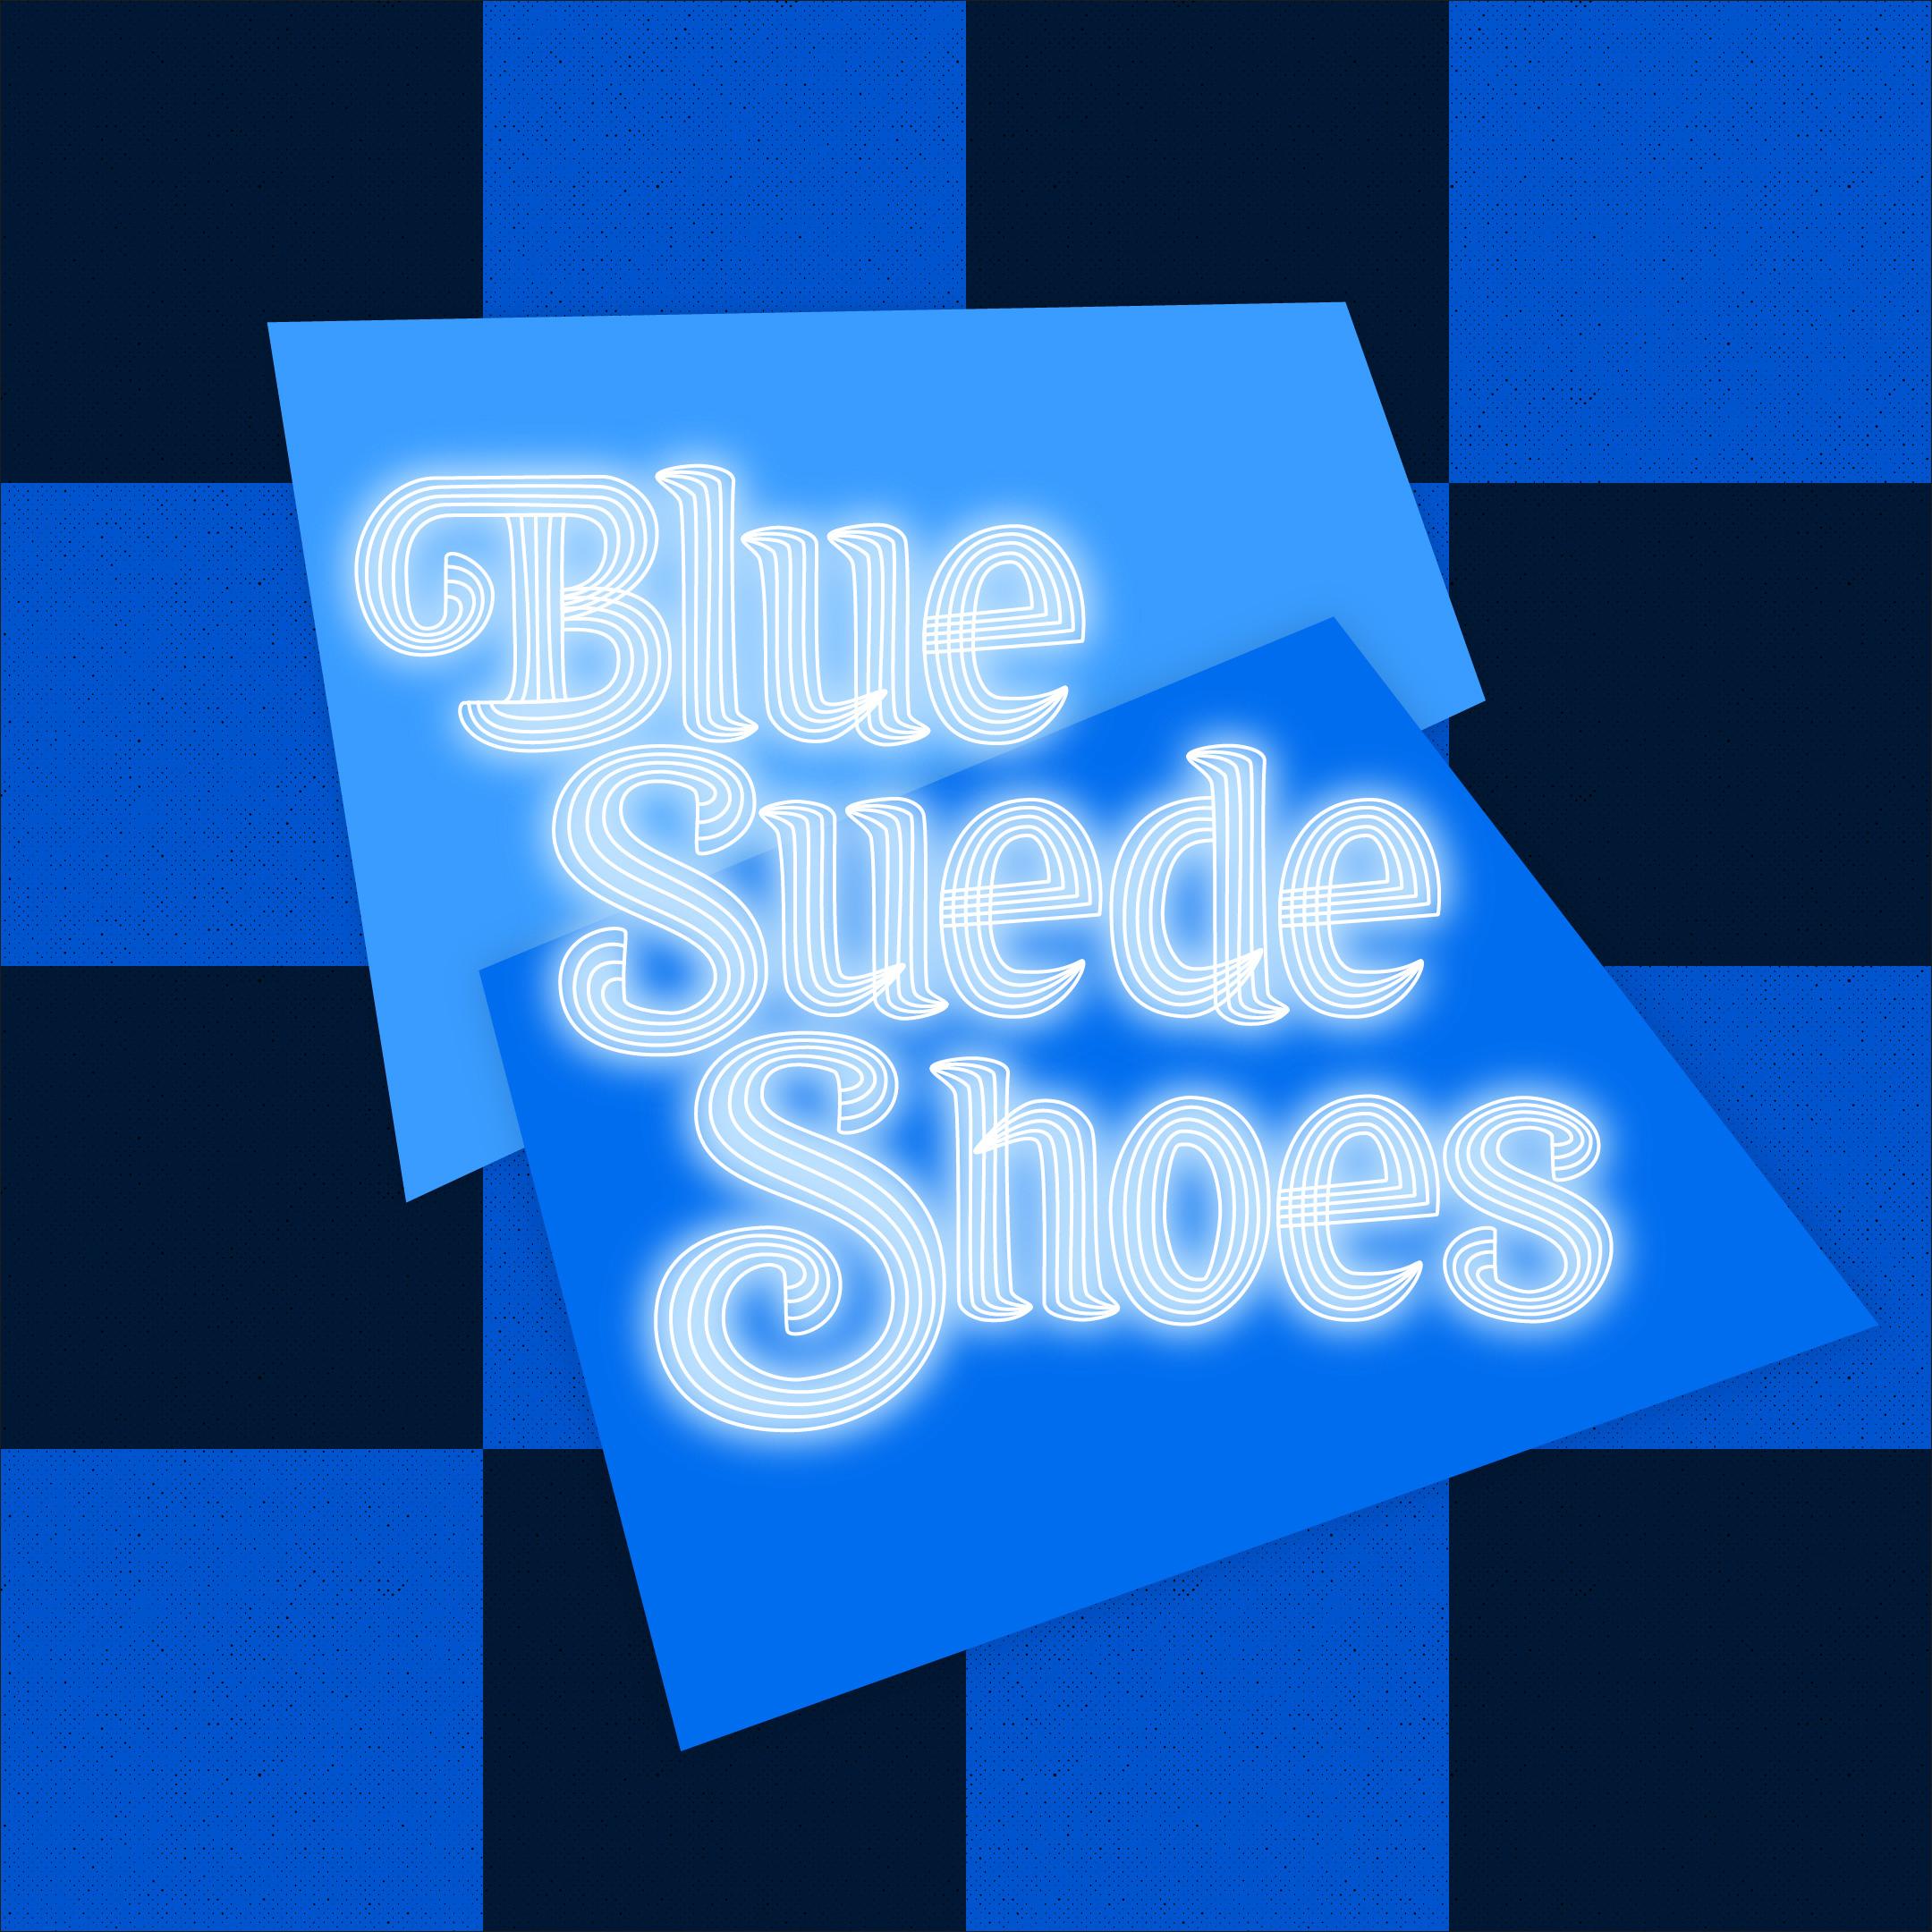 Blue-Sued-Shoes-Final.jpg